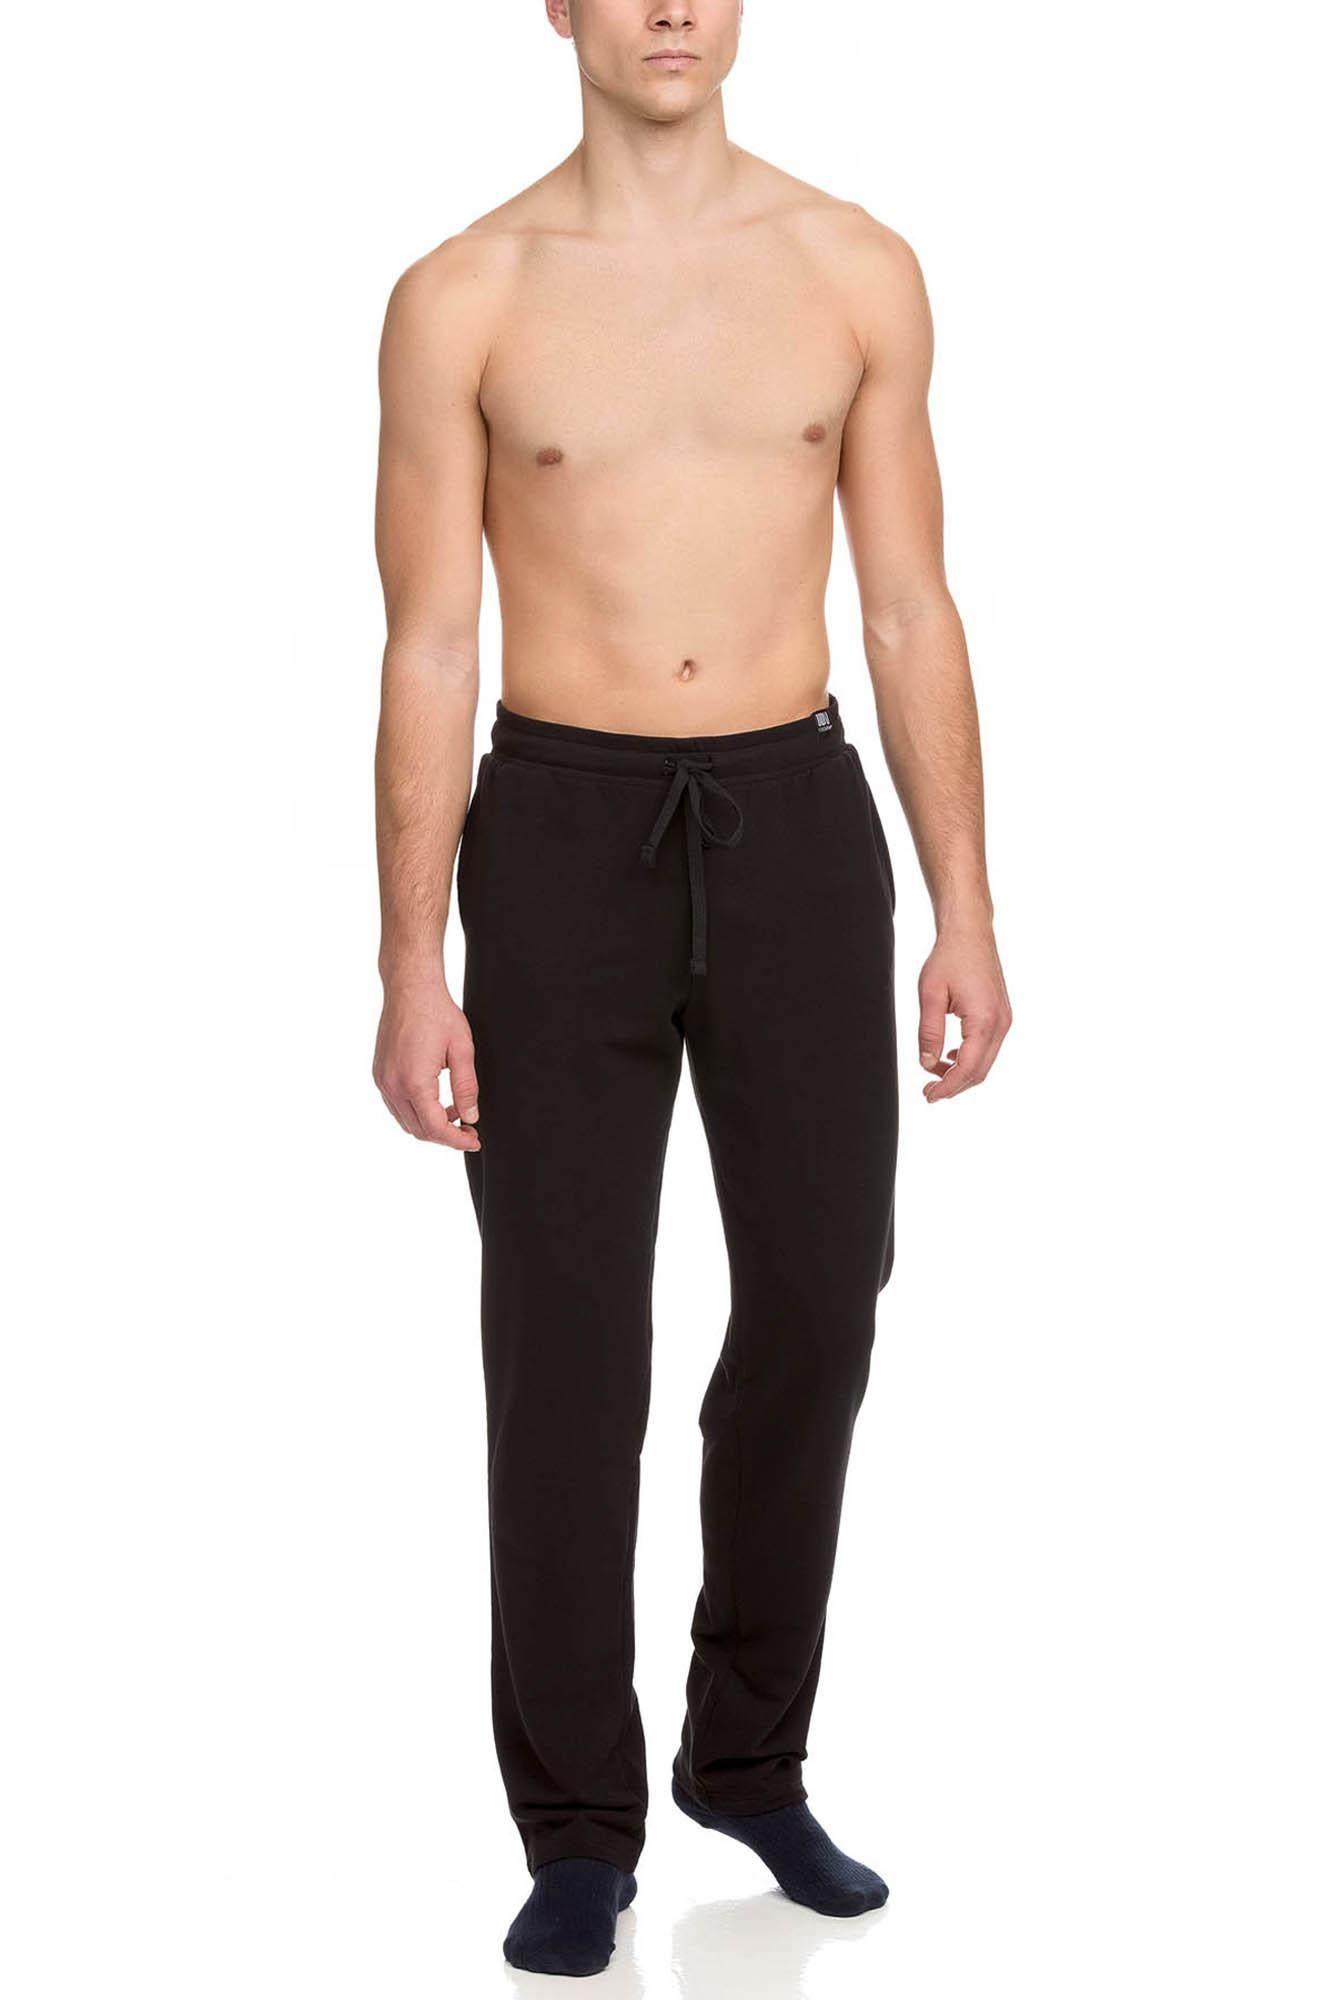 Men's Cotton Pants with Pockets